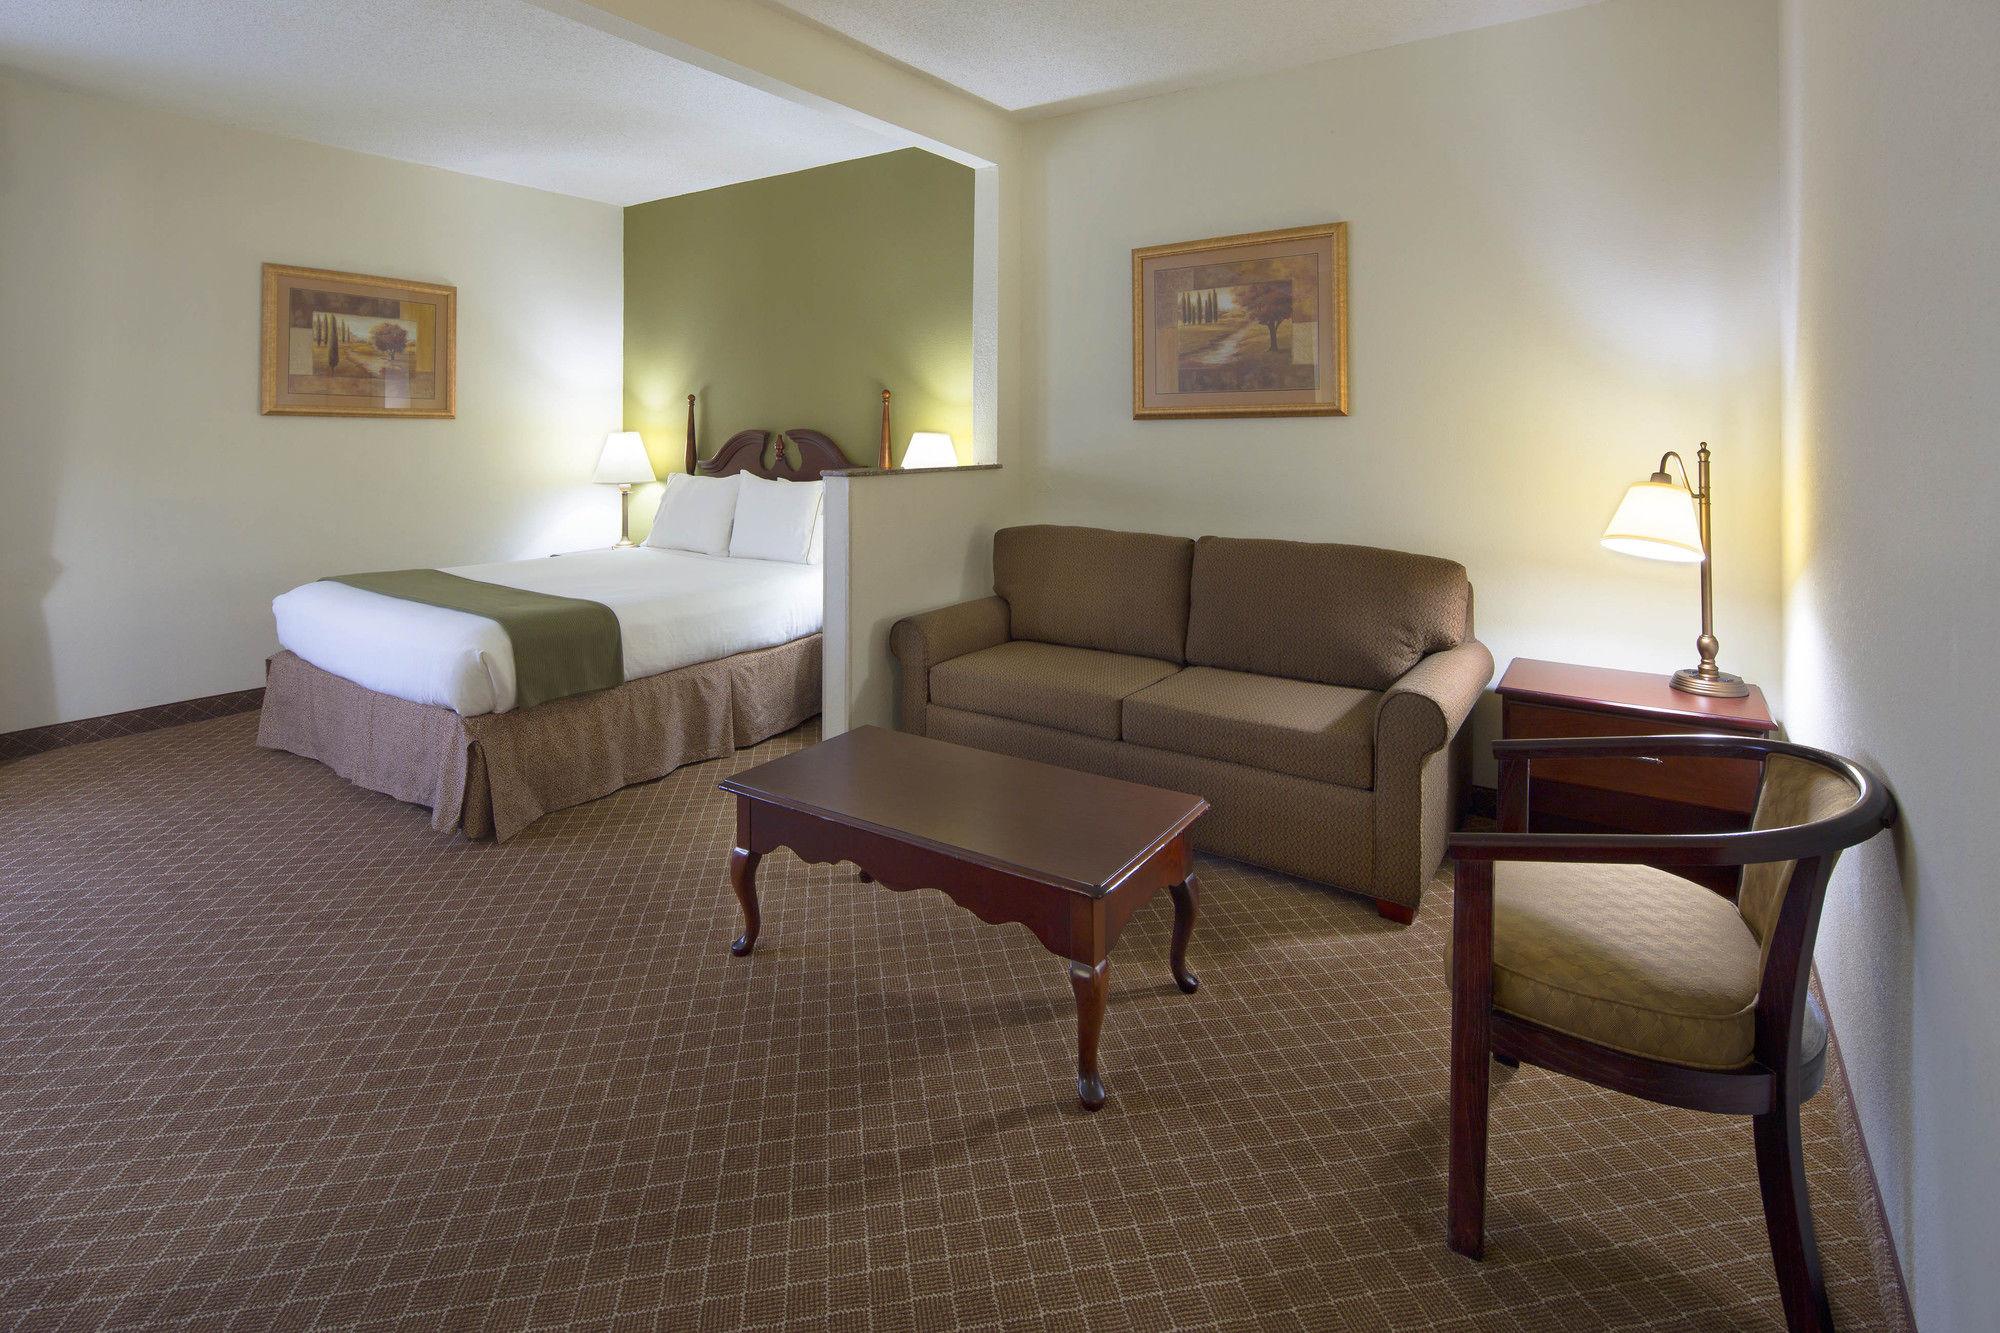 Holiday Inn Express Ft Payne in Ft Payne, AL